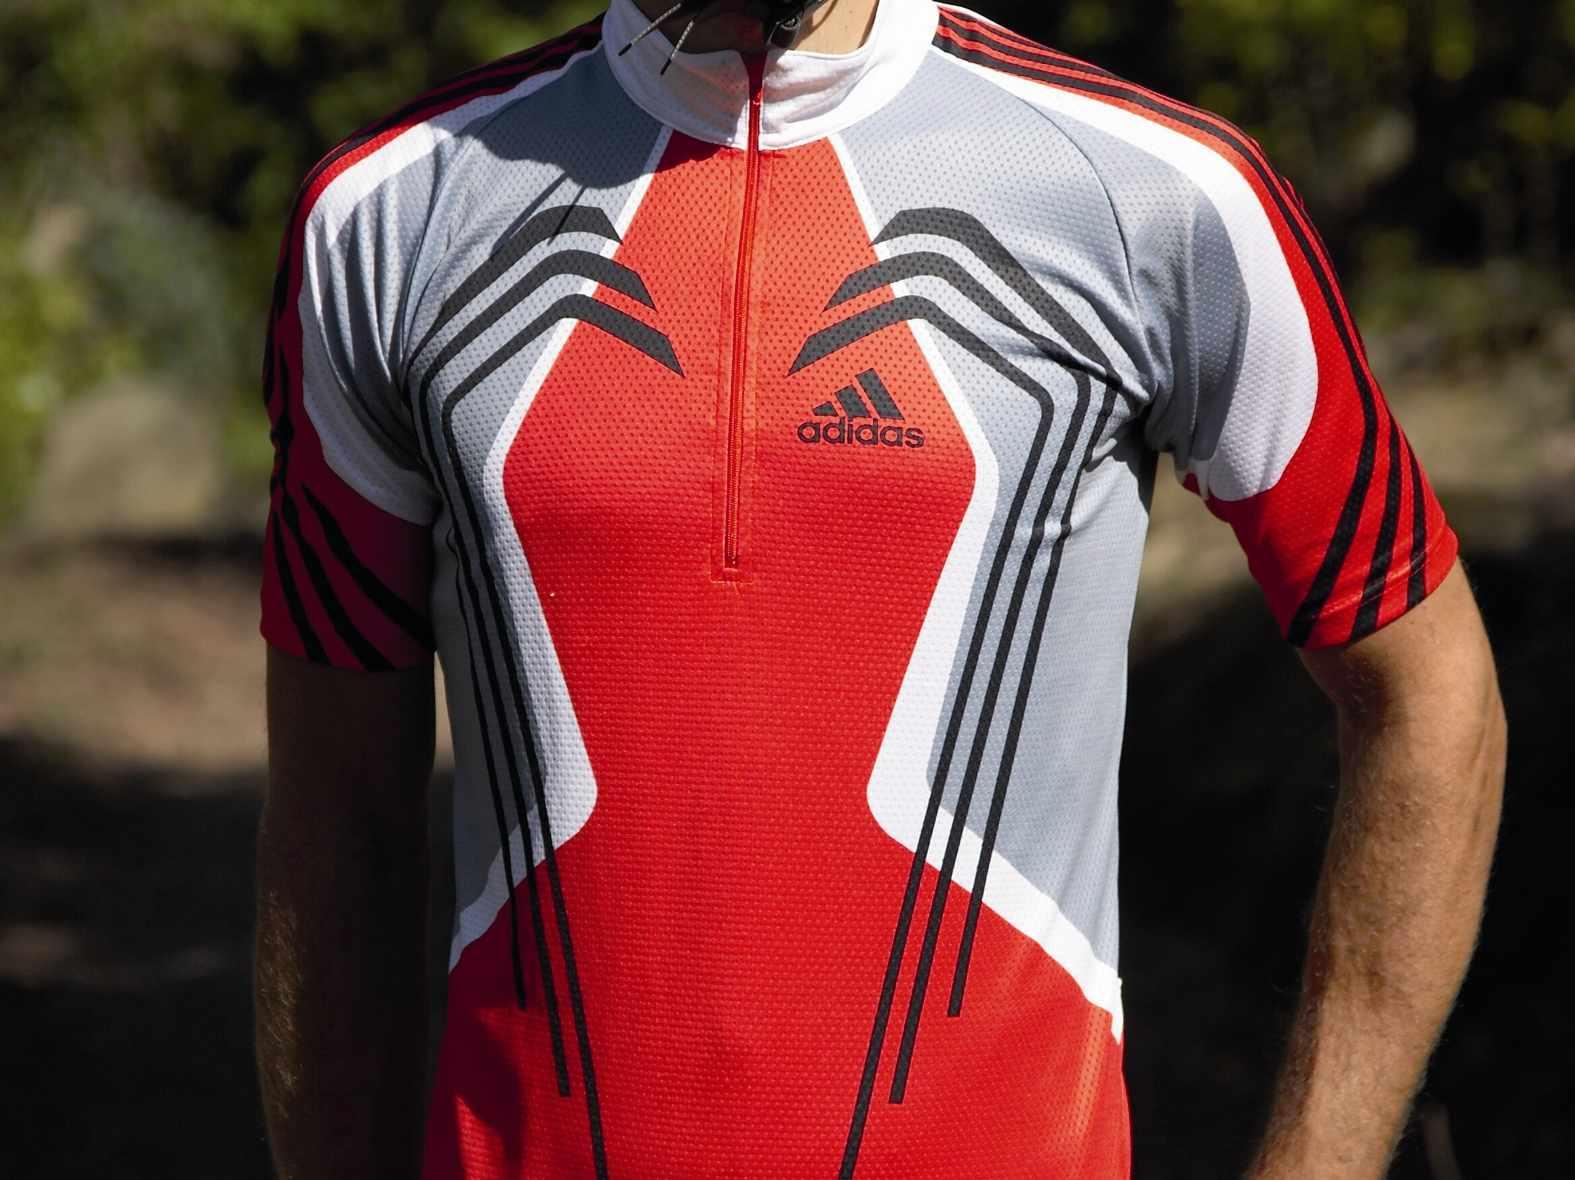 Adidas Flash jersey